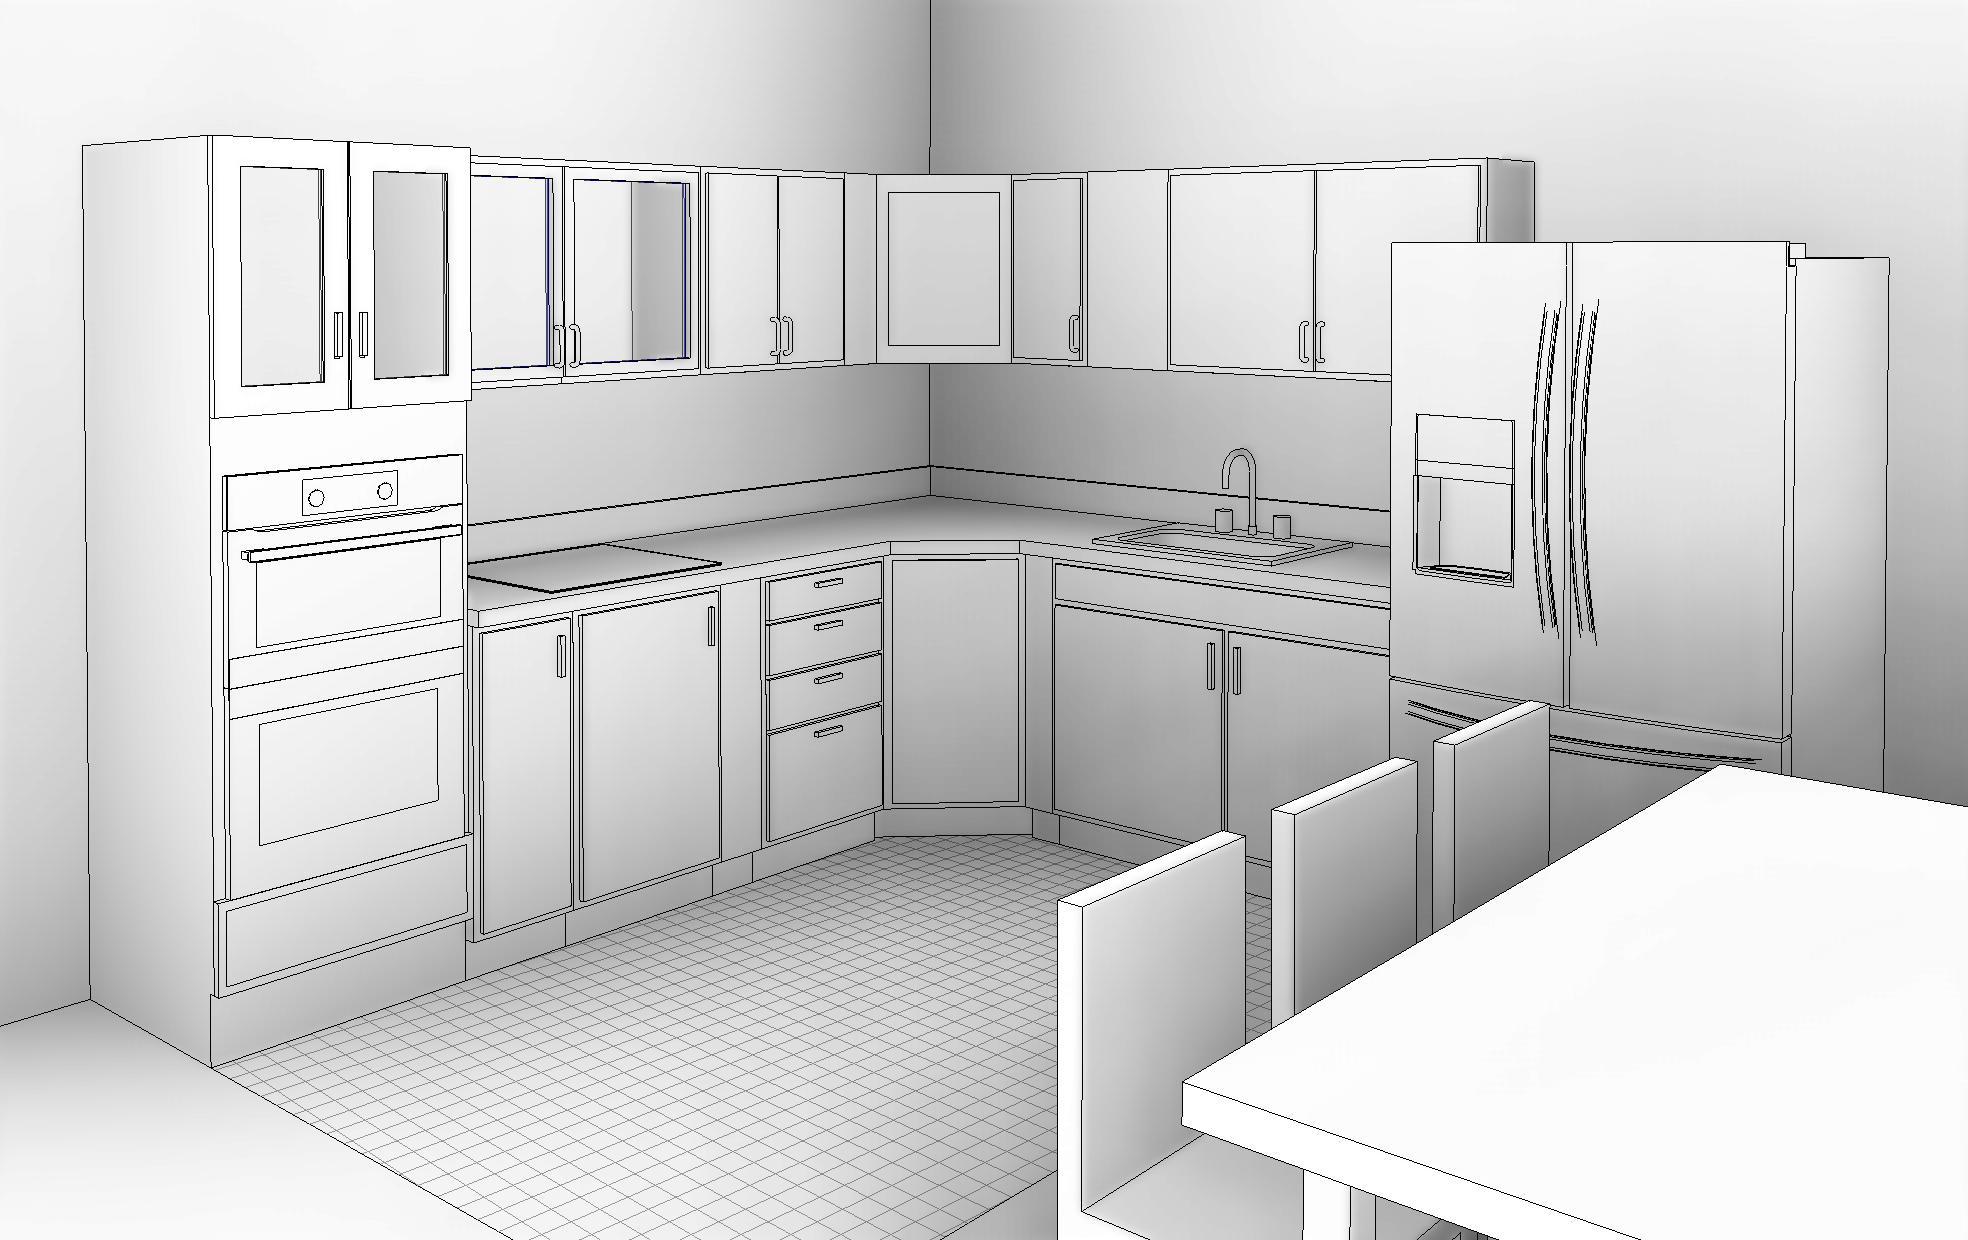 kitchen interior design in revit tutorial  balkan architect